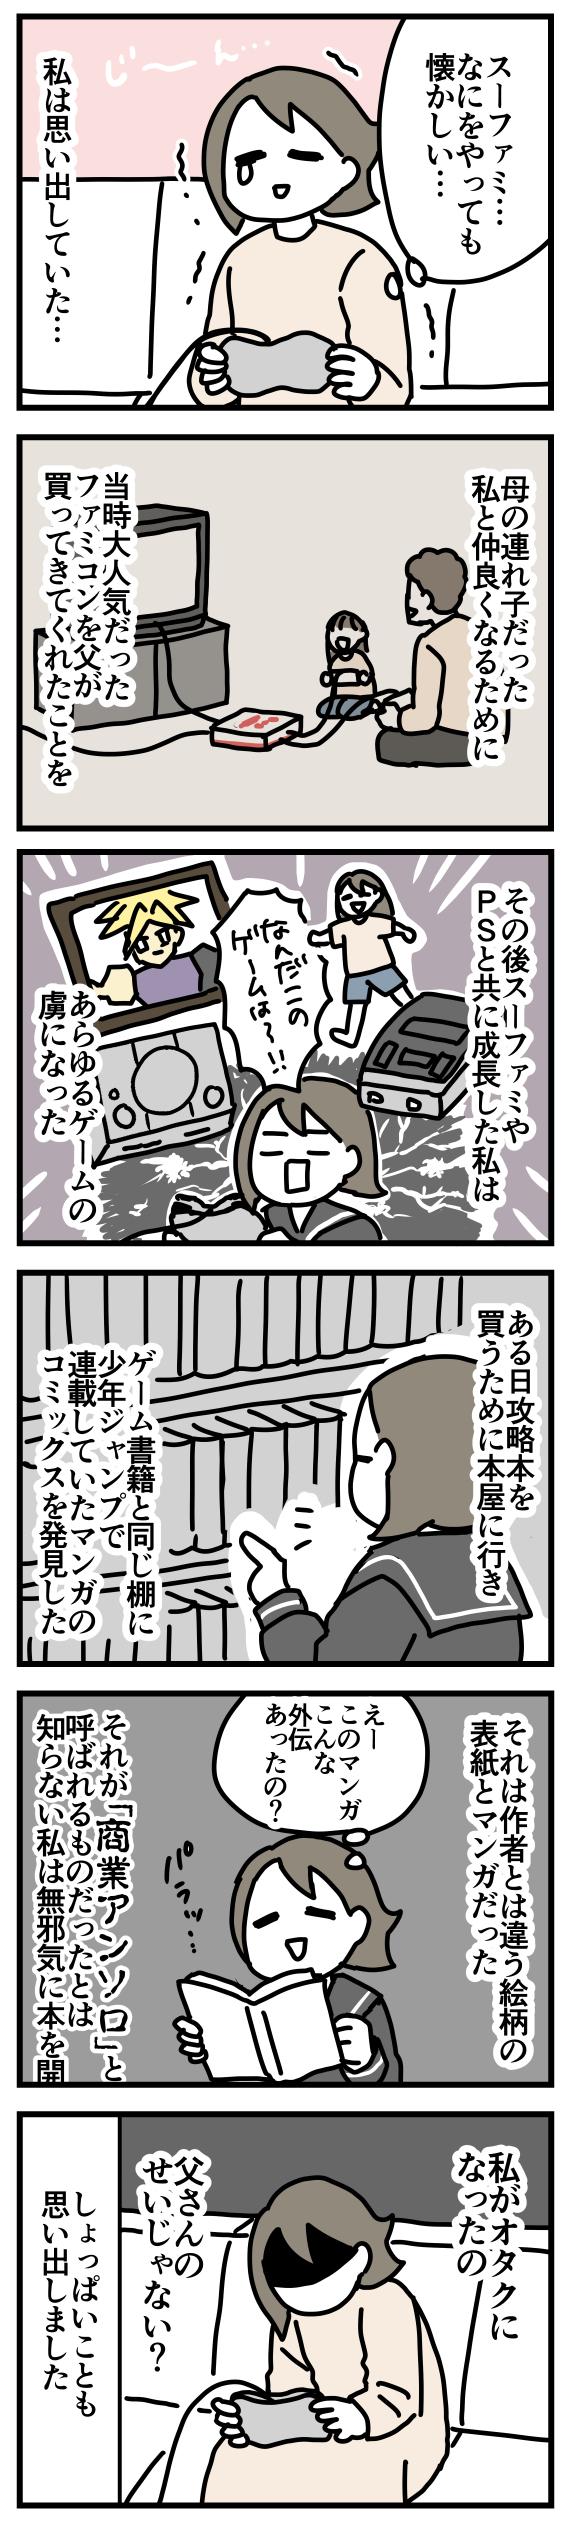 f:id:kanemotonomukuu:20171012210228j:plain